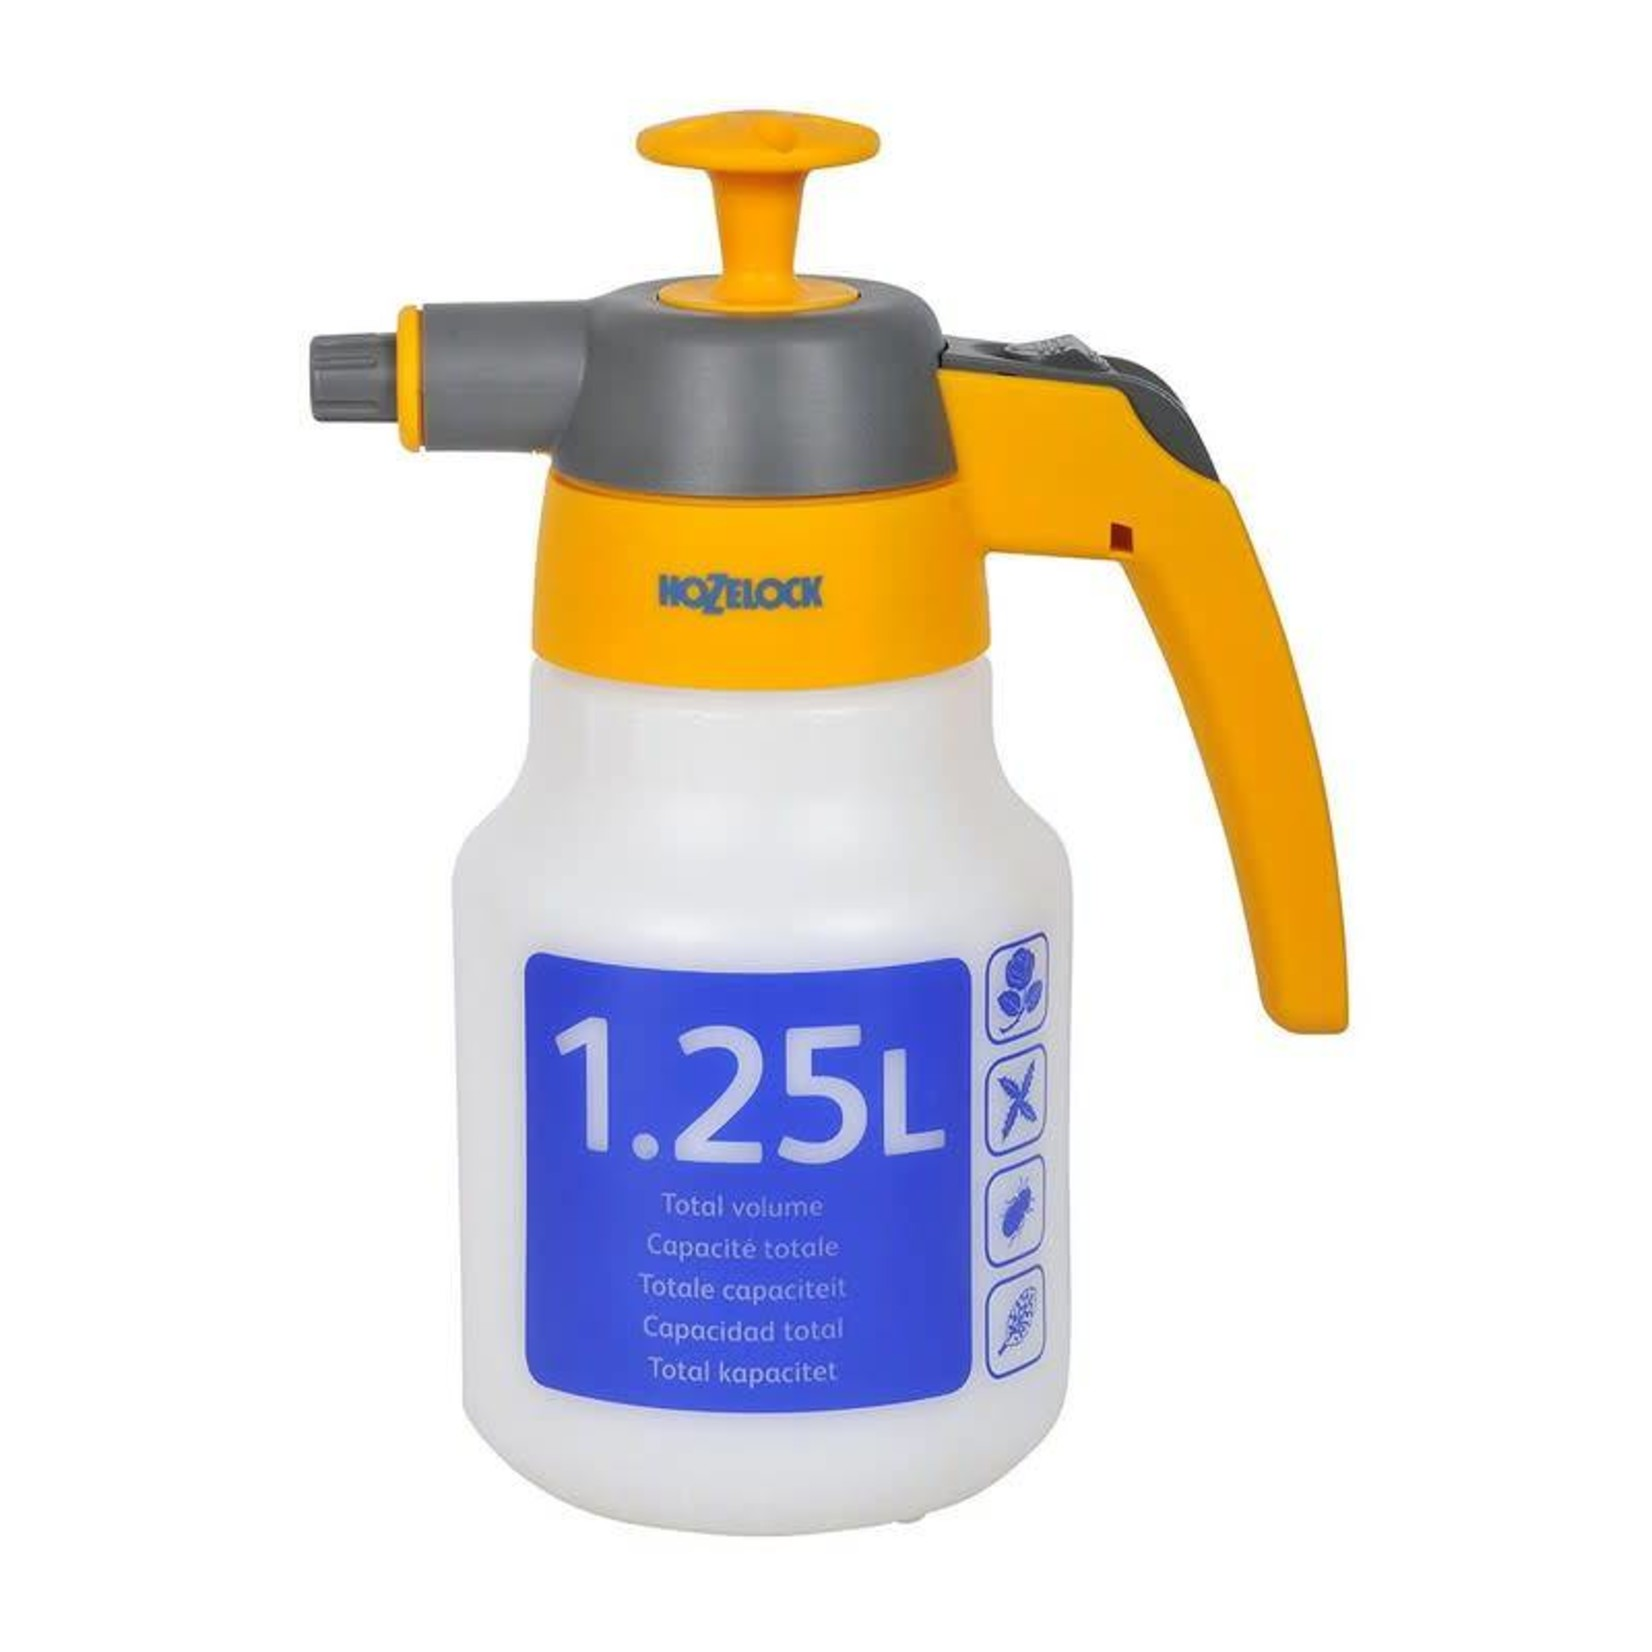 Hozelock 4122 HOZELOCK 1.25L SPRAY MIST SPRAYER  PUMP